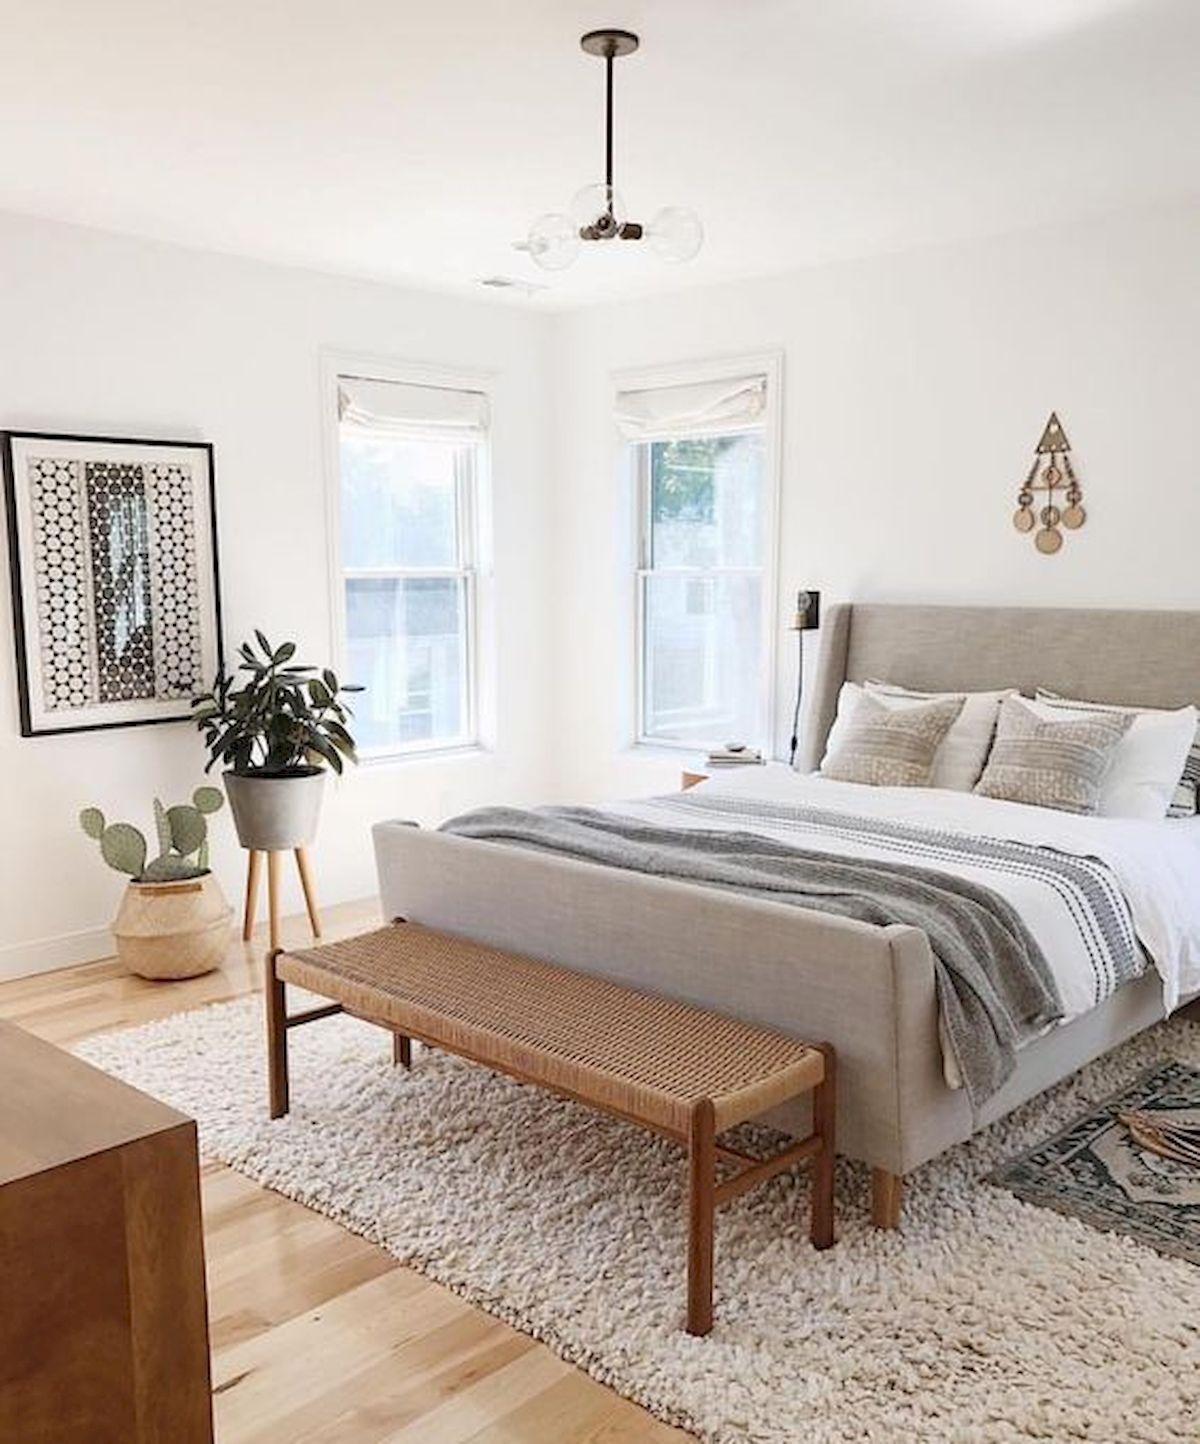 Bedroom Ideas Gray Sleigh Bed Bedroom Ideas Small Bedroom Wall Art Bedroom Bench Stool: 120 Awesome Farmhouse Master Bedroom Decor Ideas